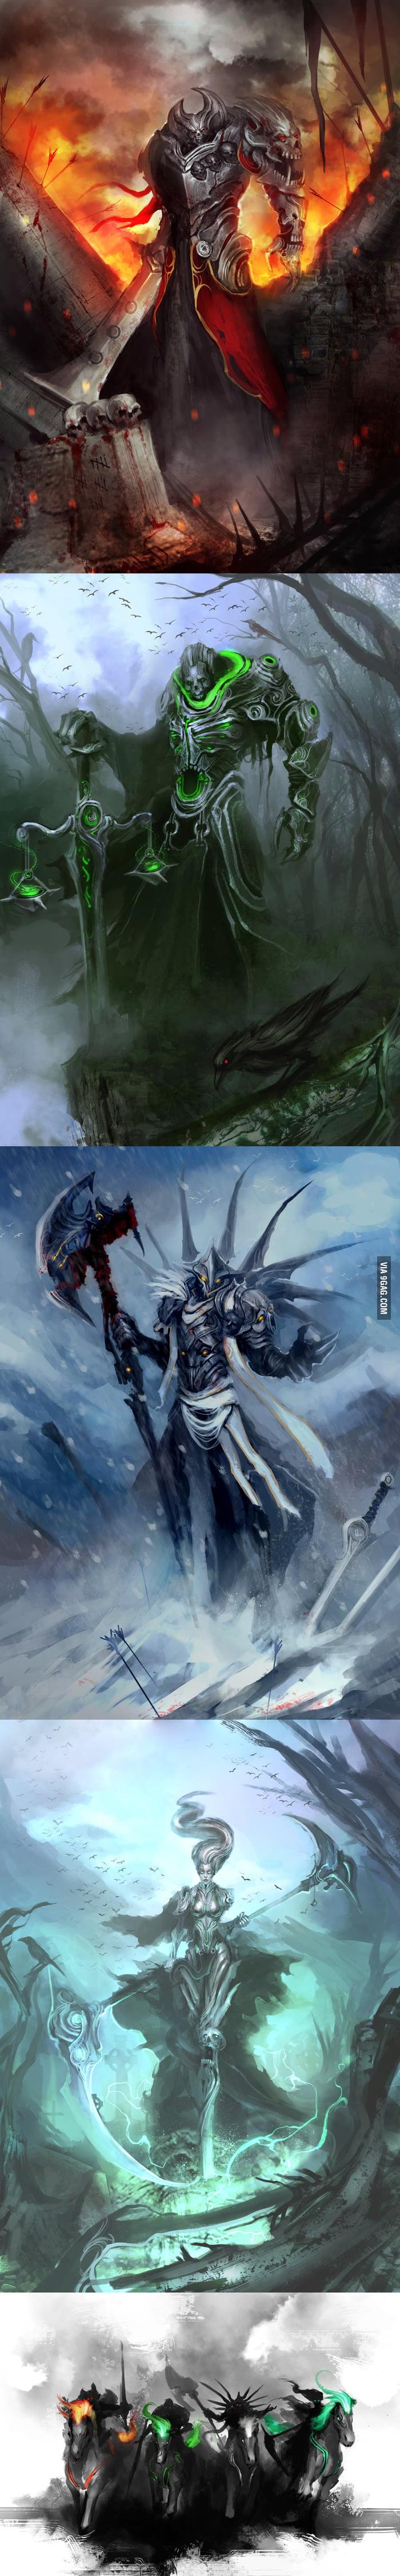 The Four Horsemen Of The Apocalypse (Badass Version) - 9GAG